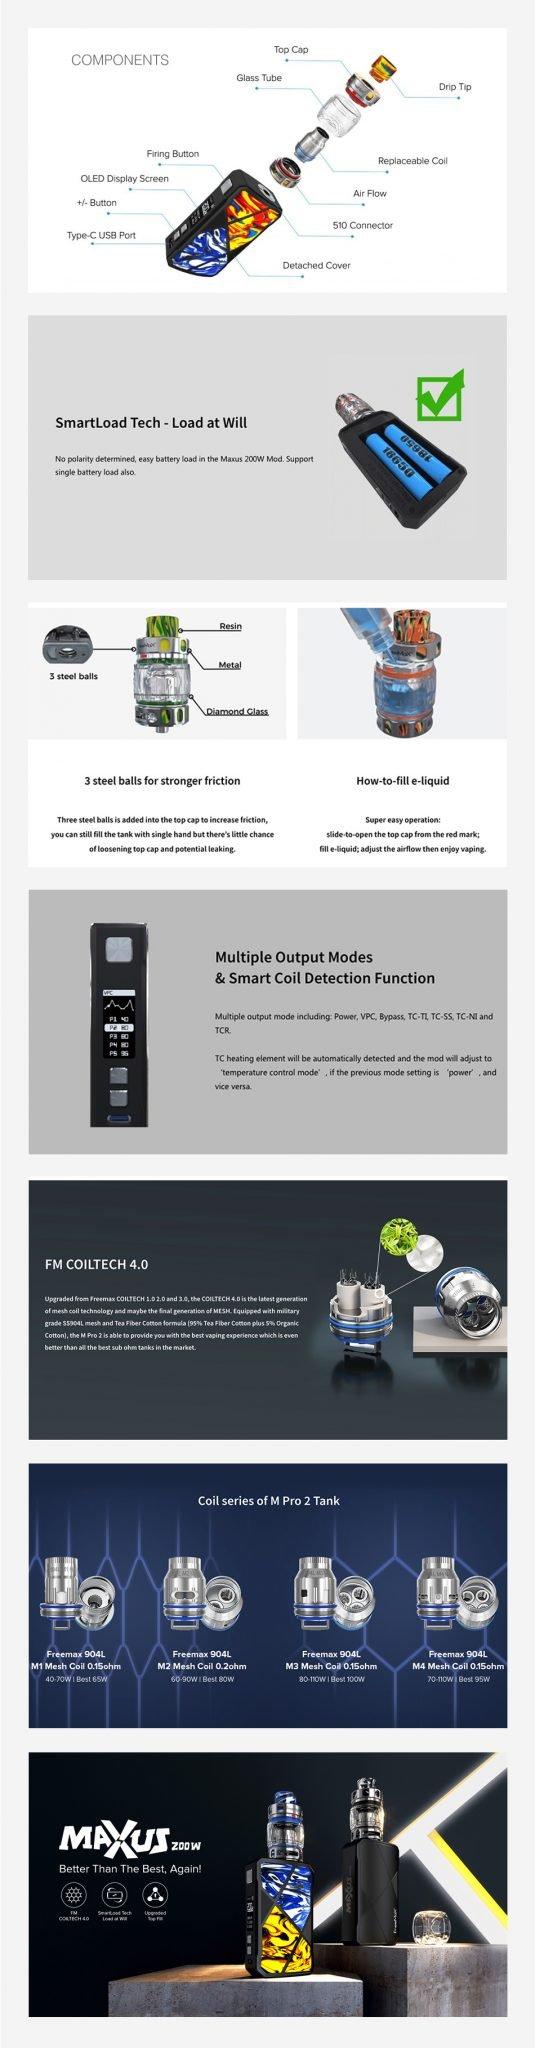 Freemax-Maxus-200W-TC-Kit-Features-UK